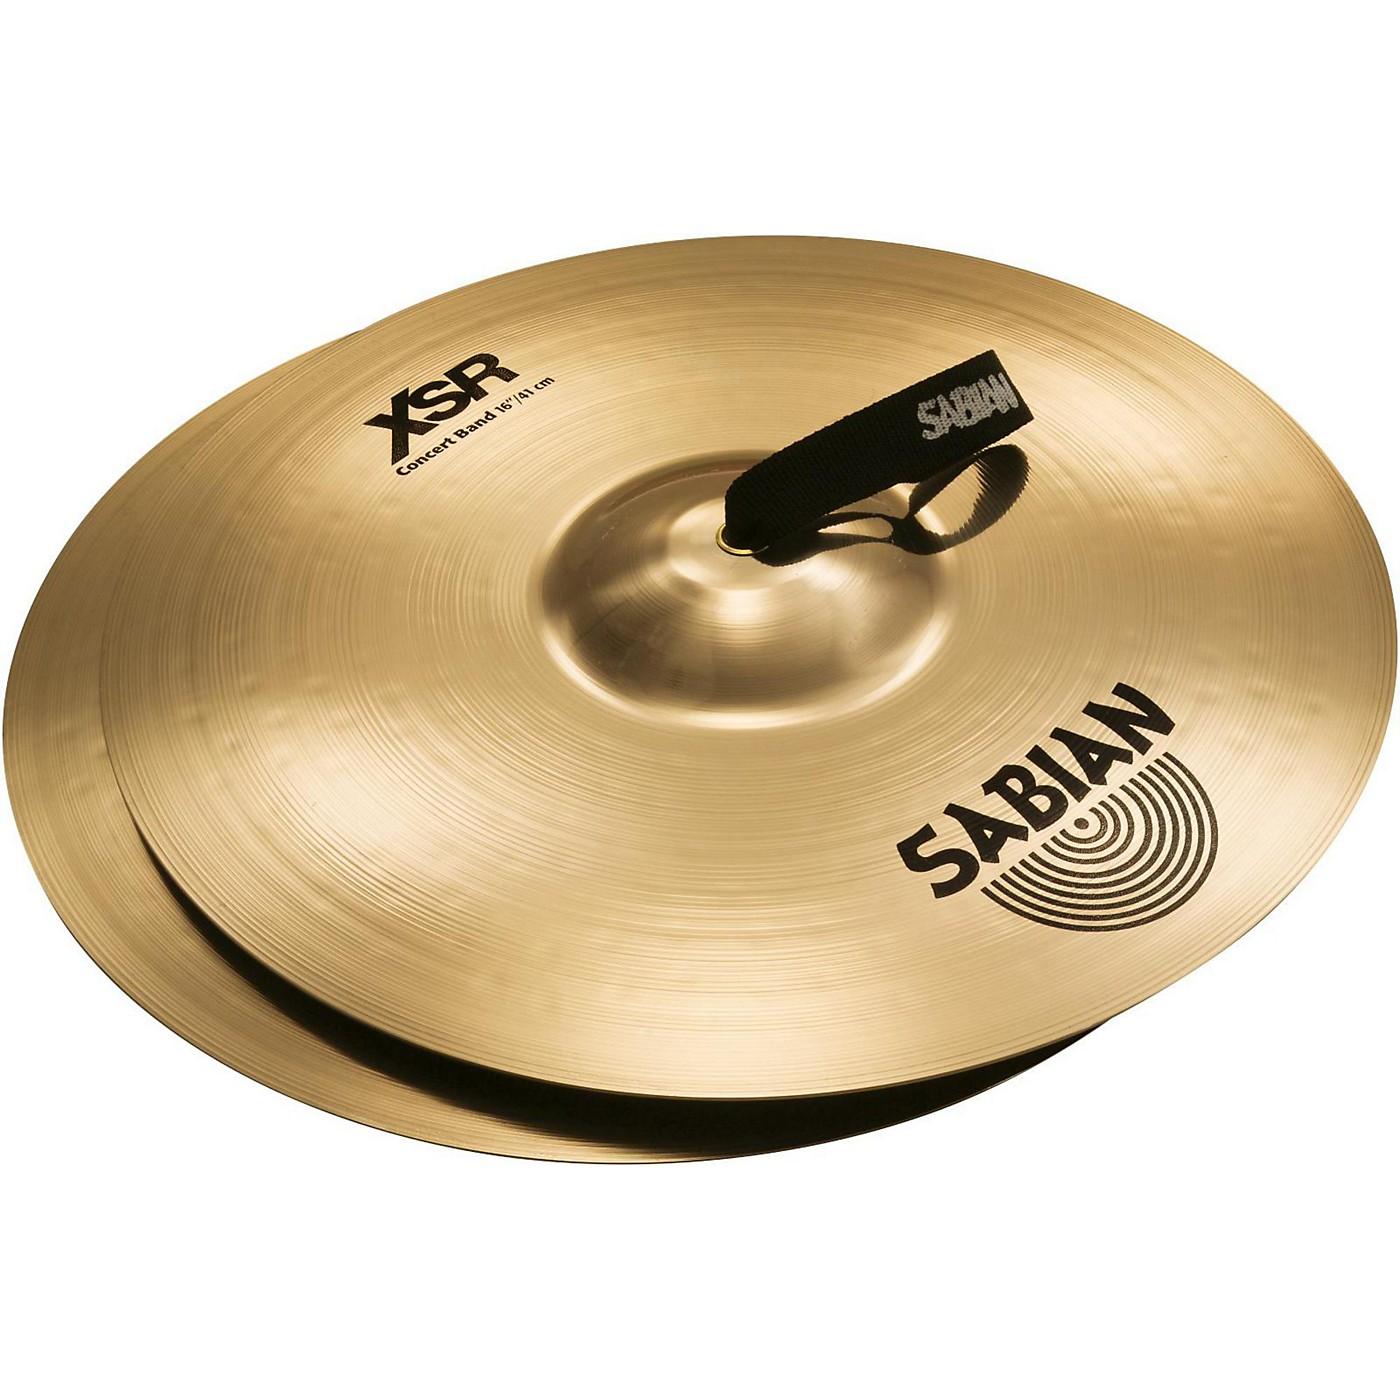 Sabian XSR Concert Band thumbnail